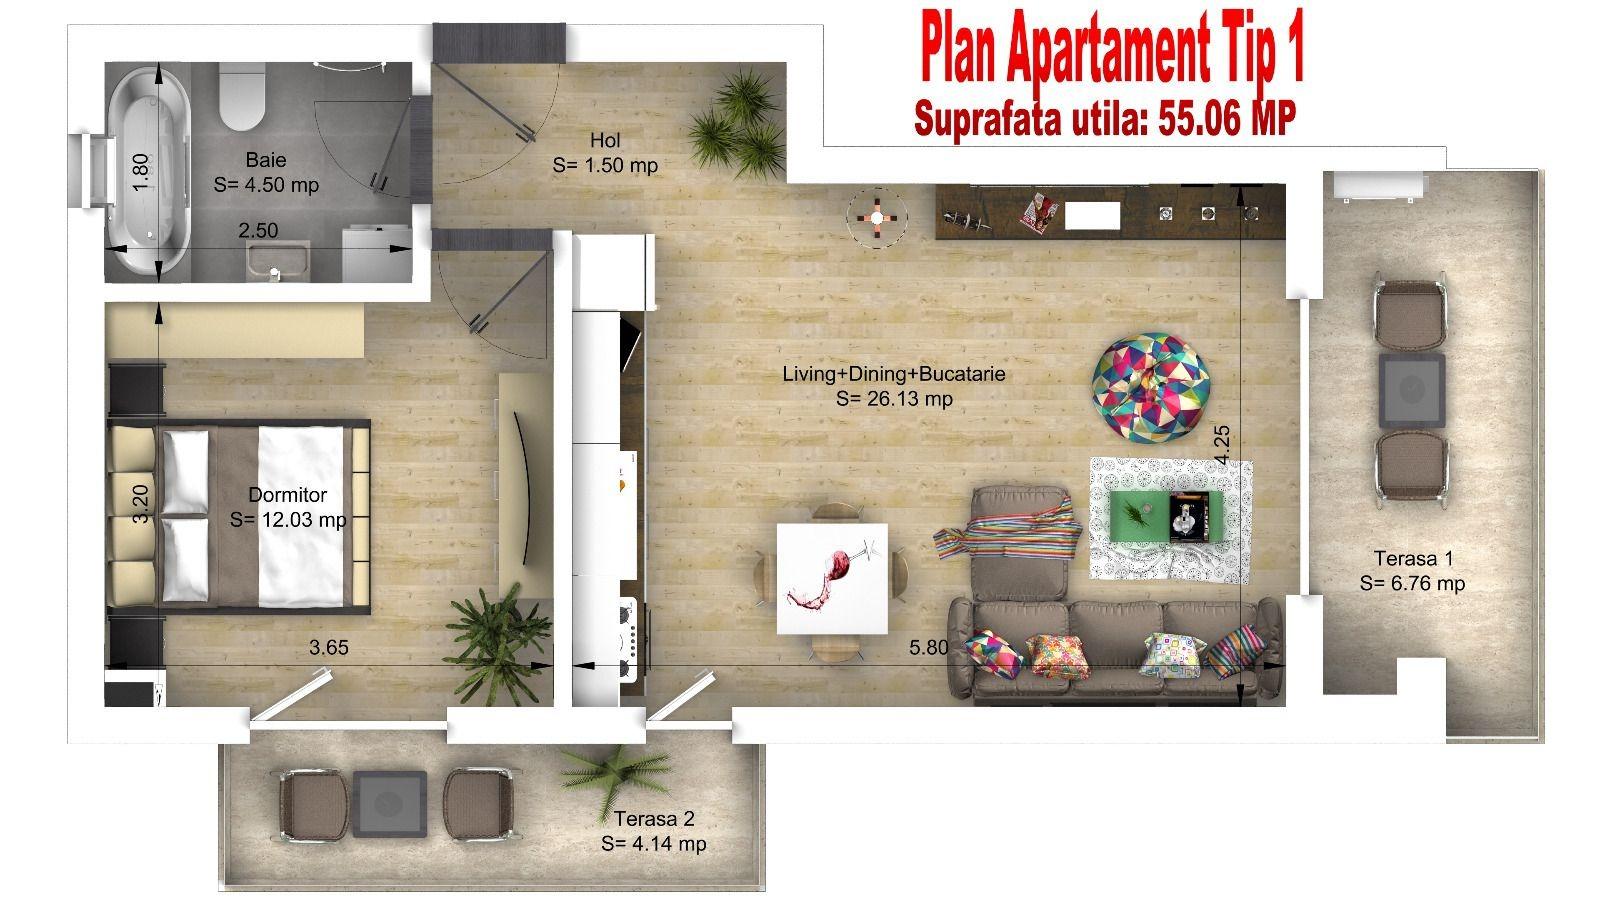 Plan Apartament Tip 1